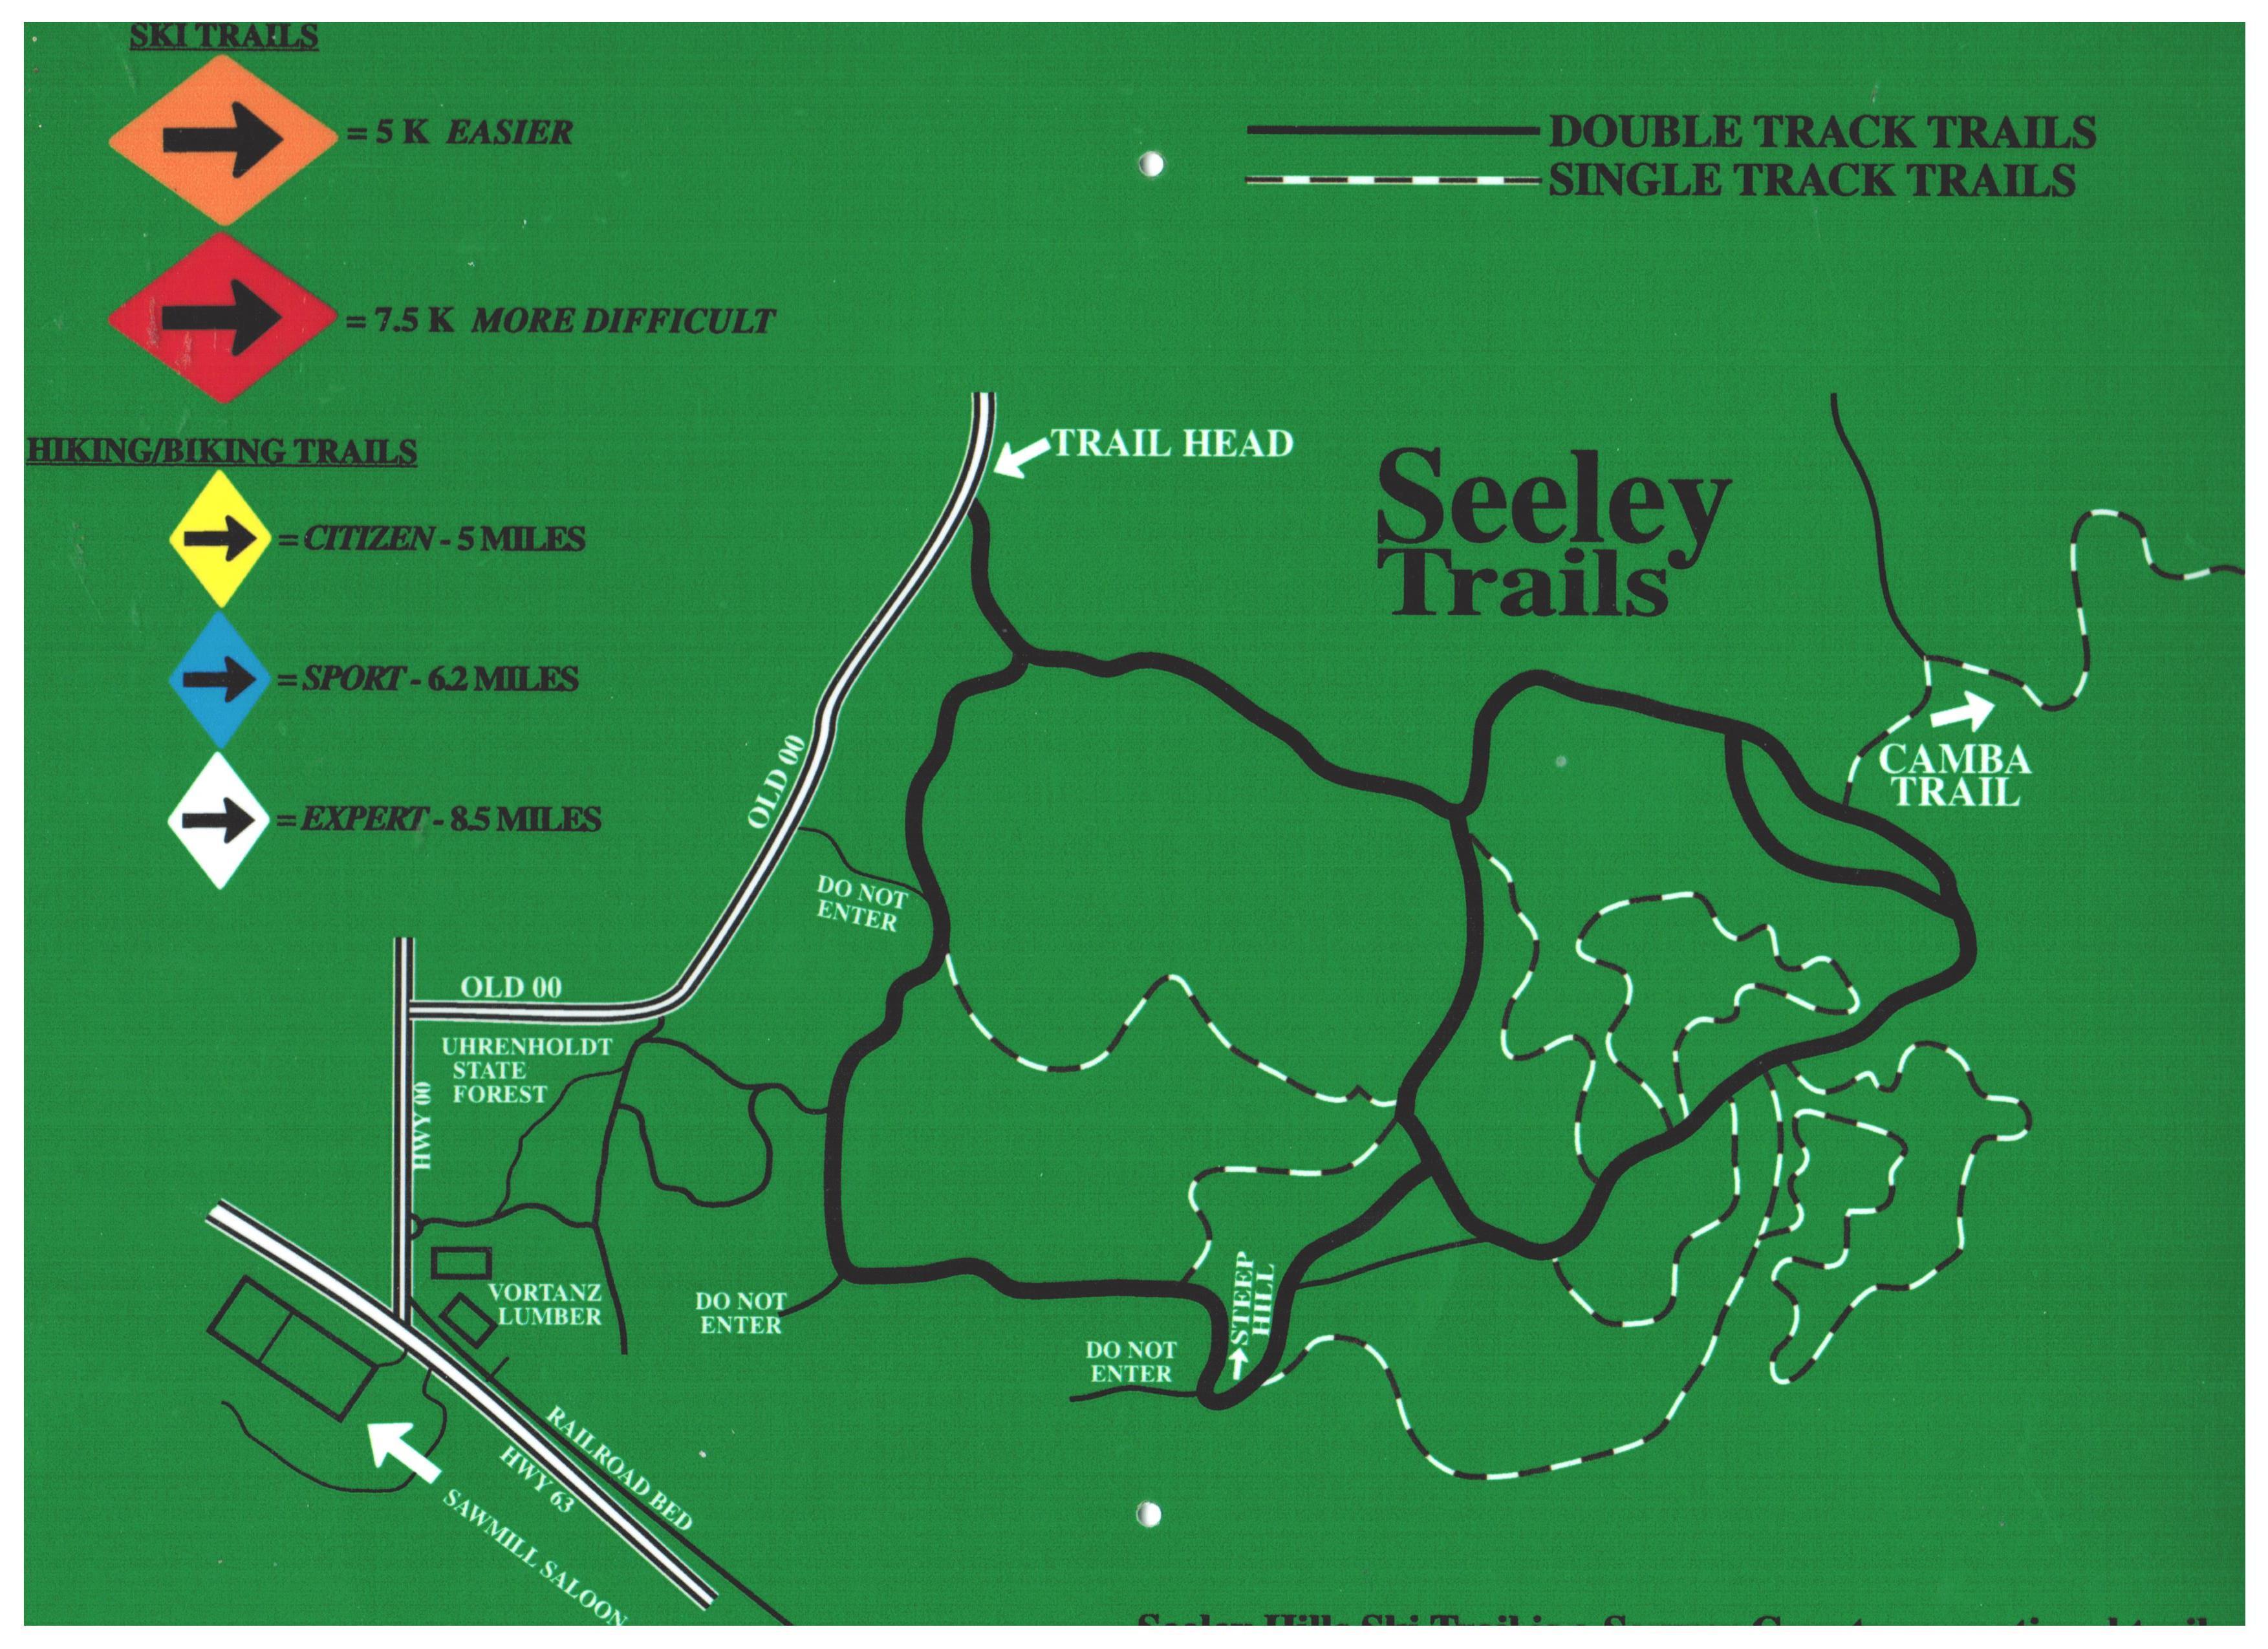 Seeley Hills Trail Map Seeley Lions Club Hayward Wisconsin